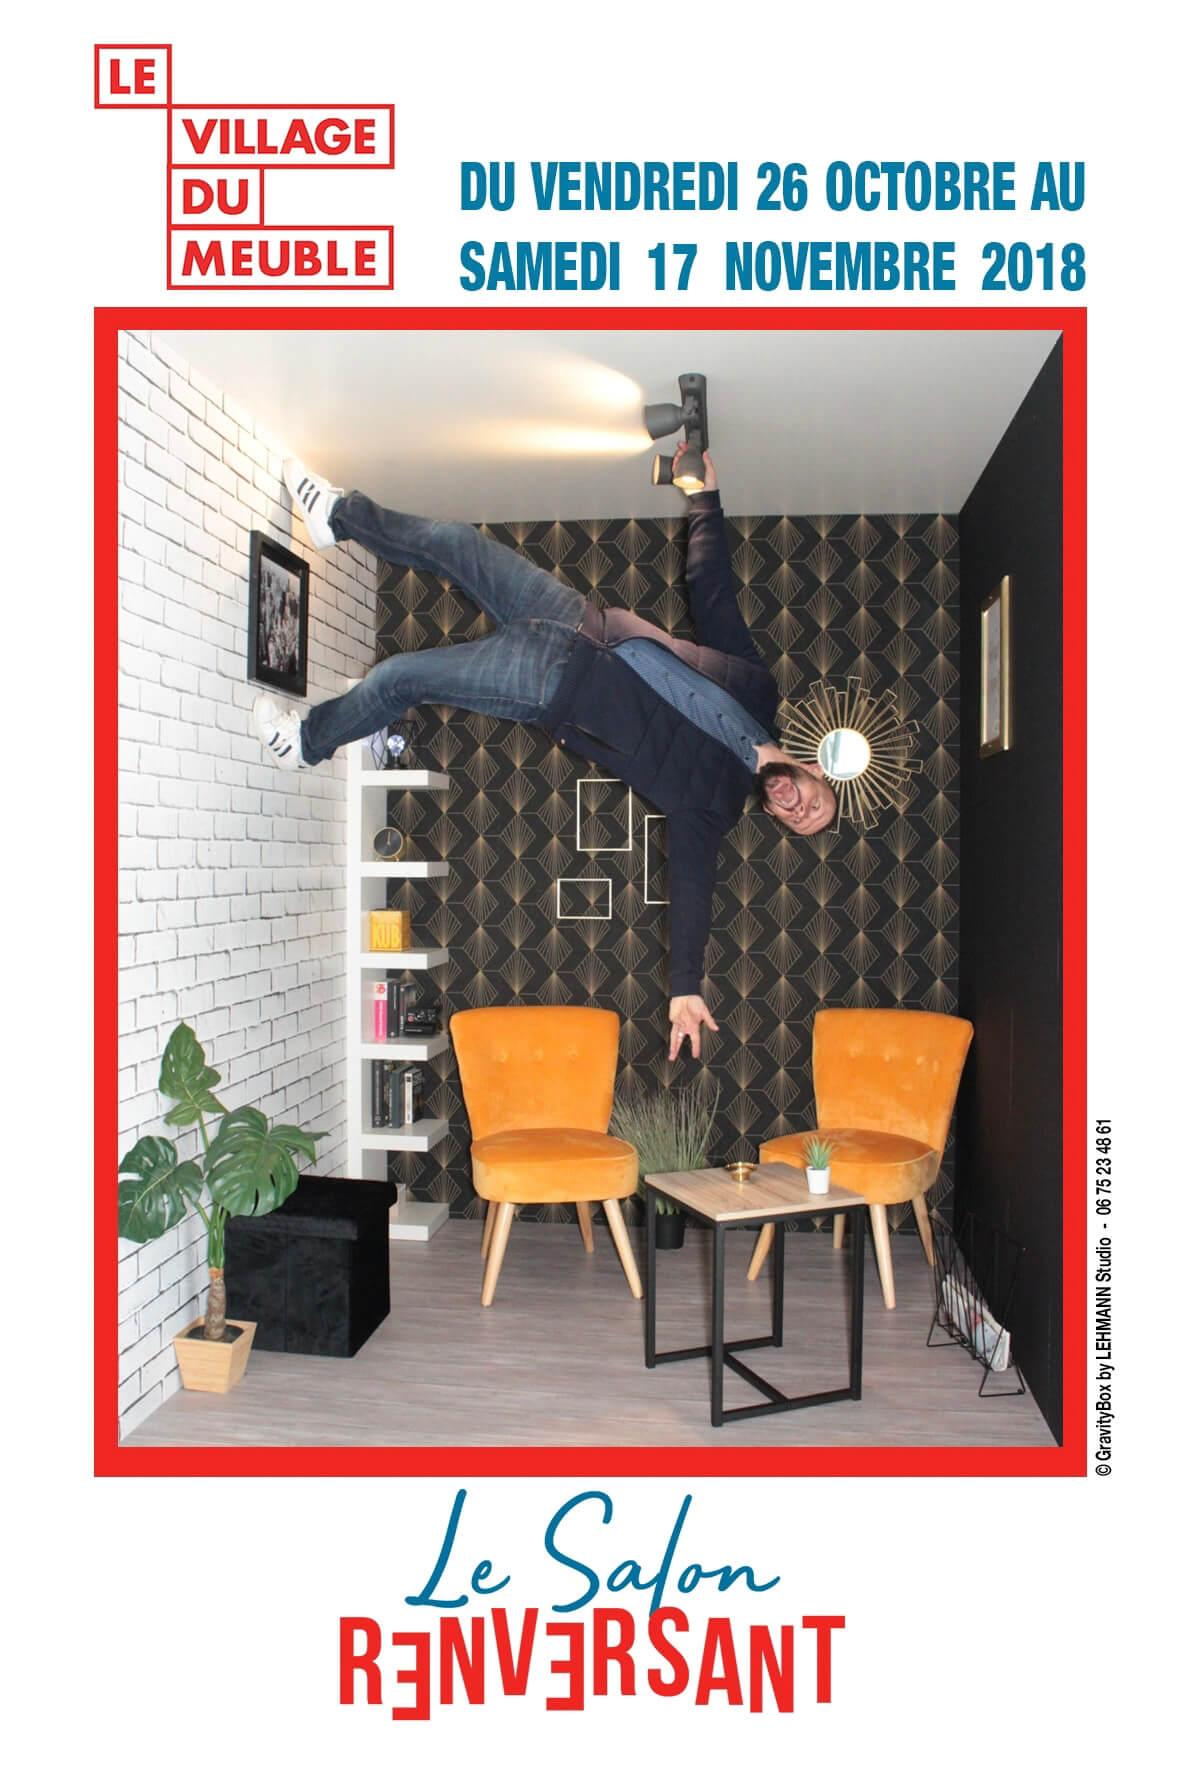 lehman-studio-photographe-angers-evenementiel-gravitybox-ambiance-maison-village-du-meuble